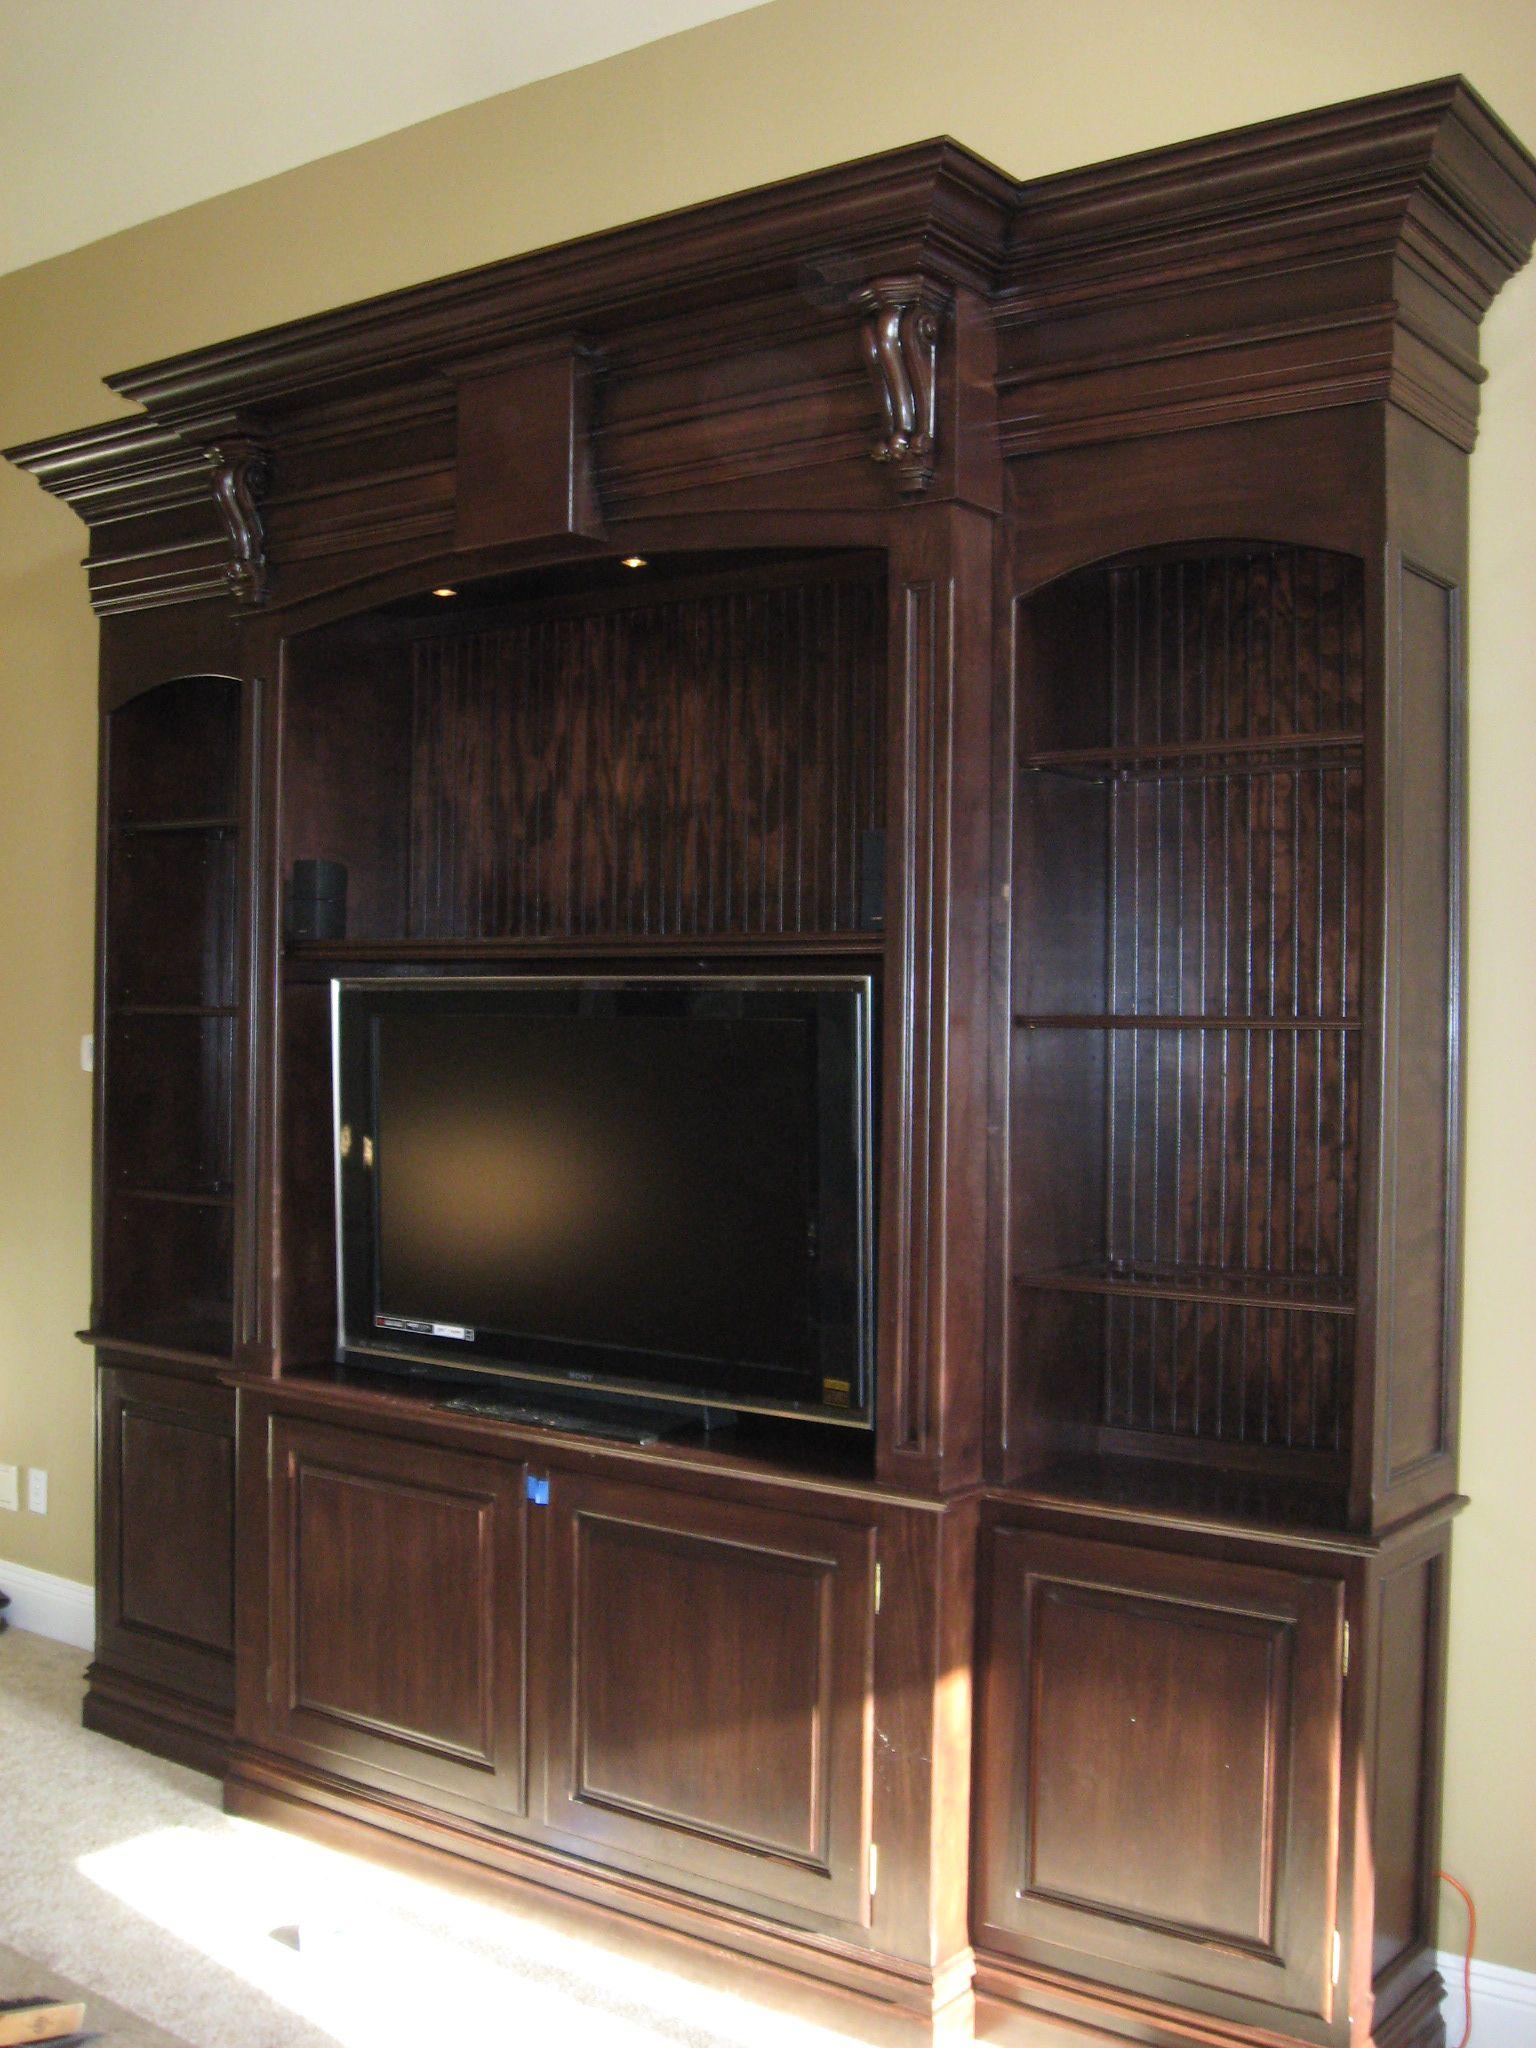 Poplar For Cabinets Wall Unit 12 Wide X 10 High Birch Veneers Poplar Solids Stain